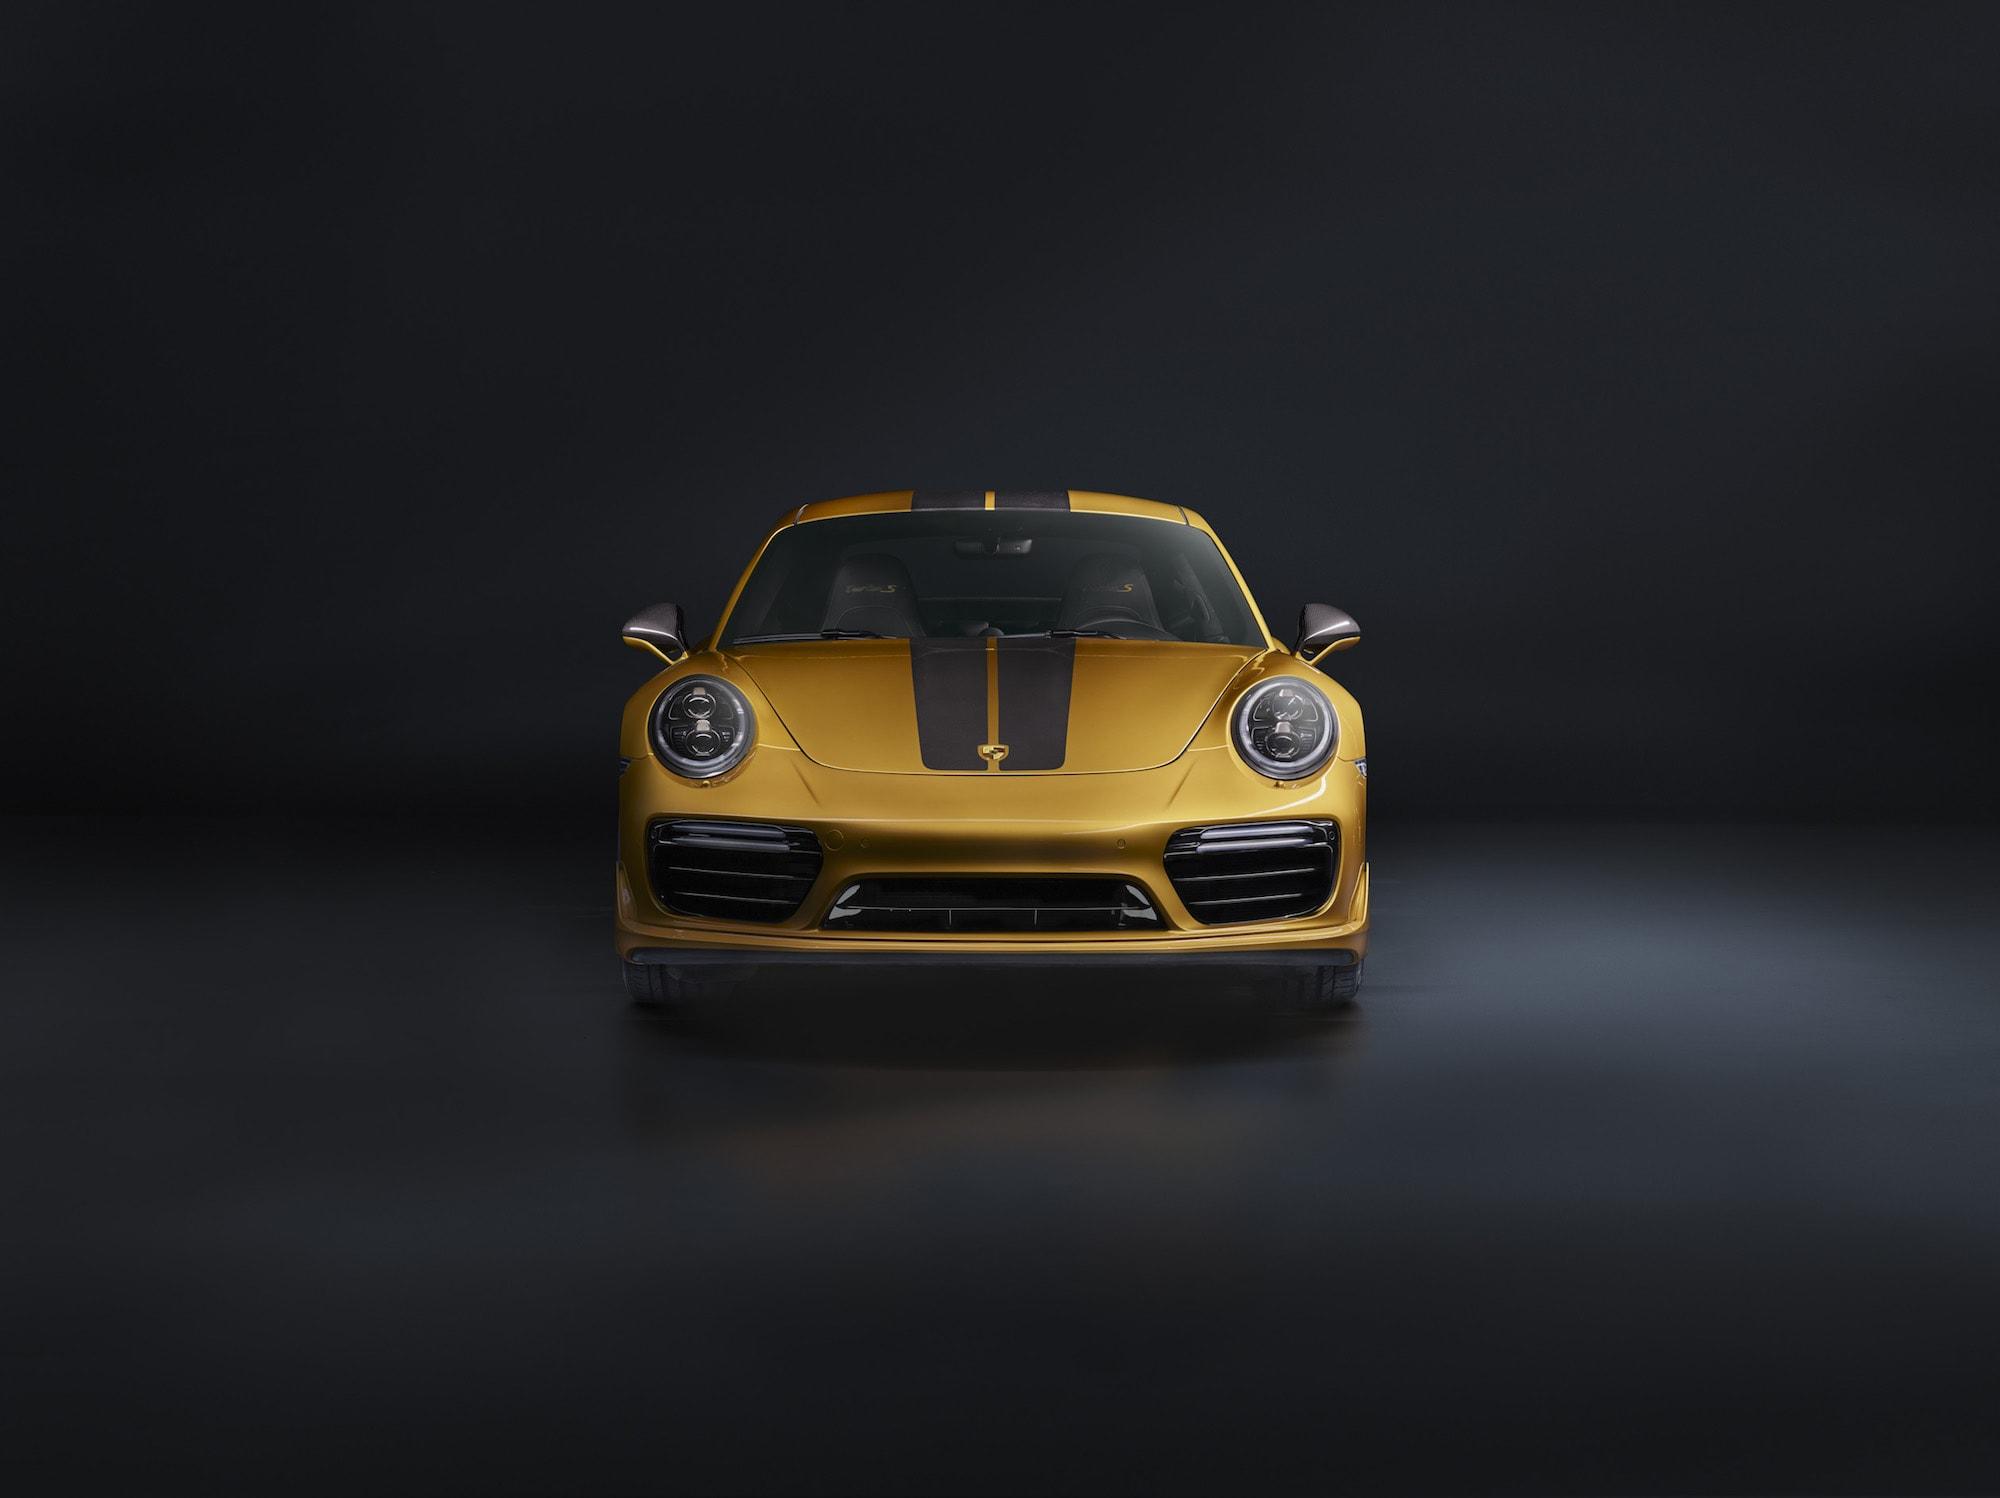 Echt goldig: Der Neue 911 Turbo S Exclusive Series 4